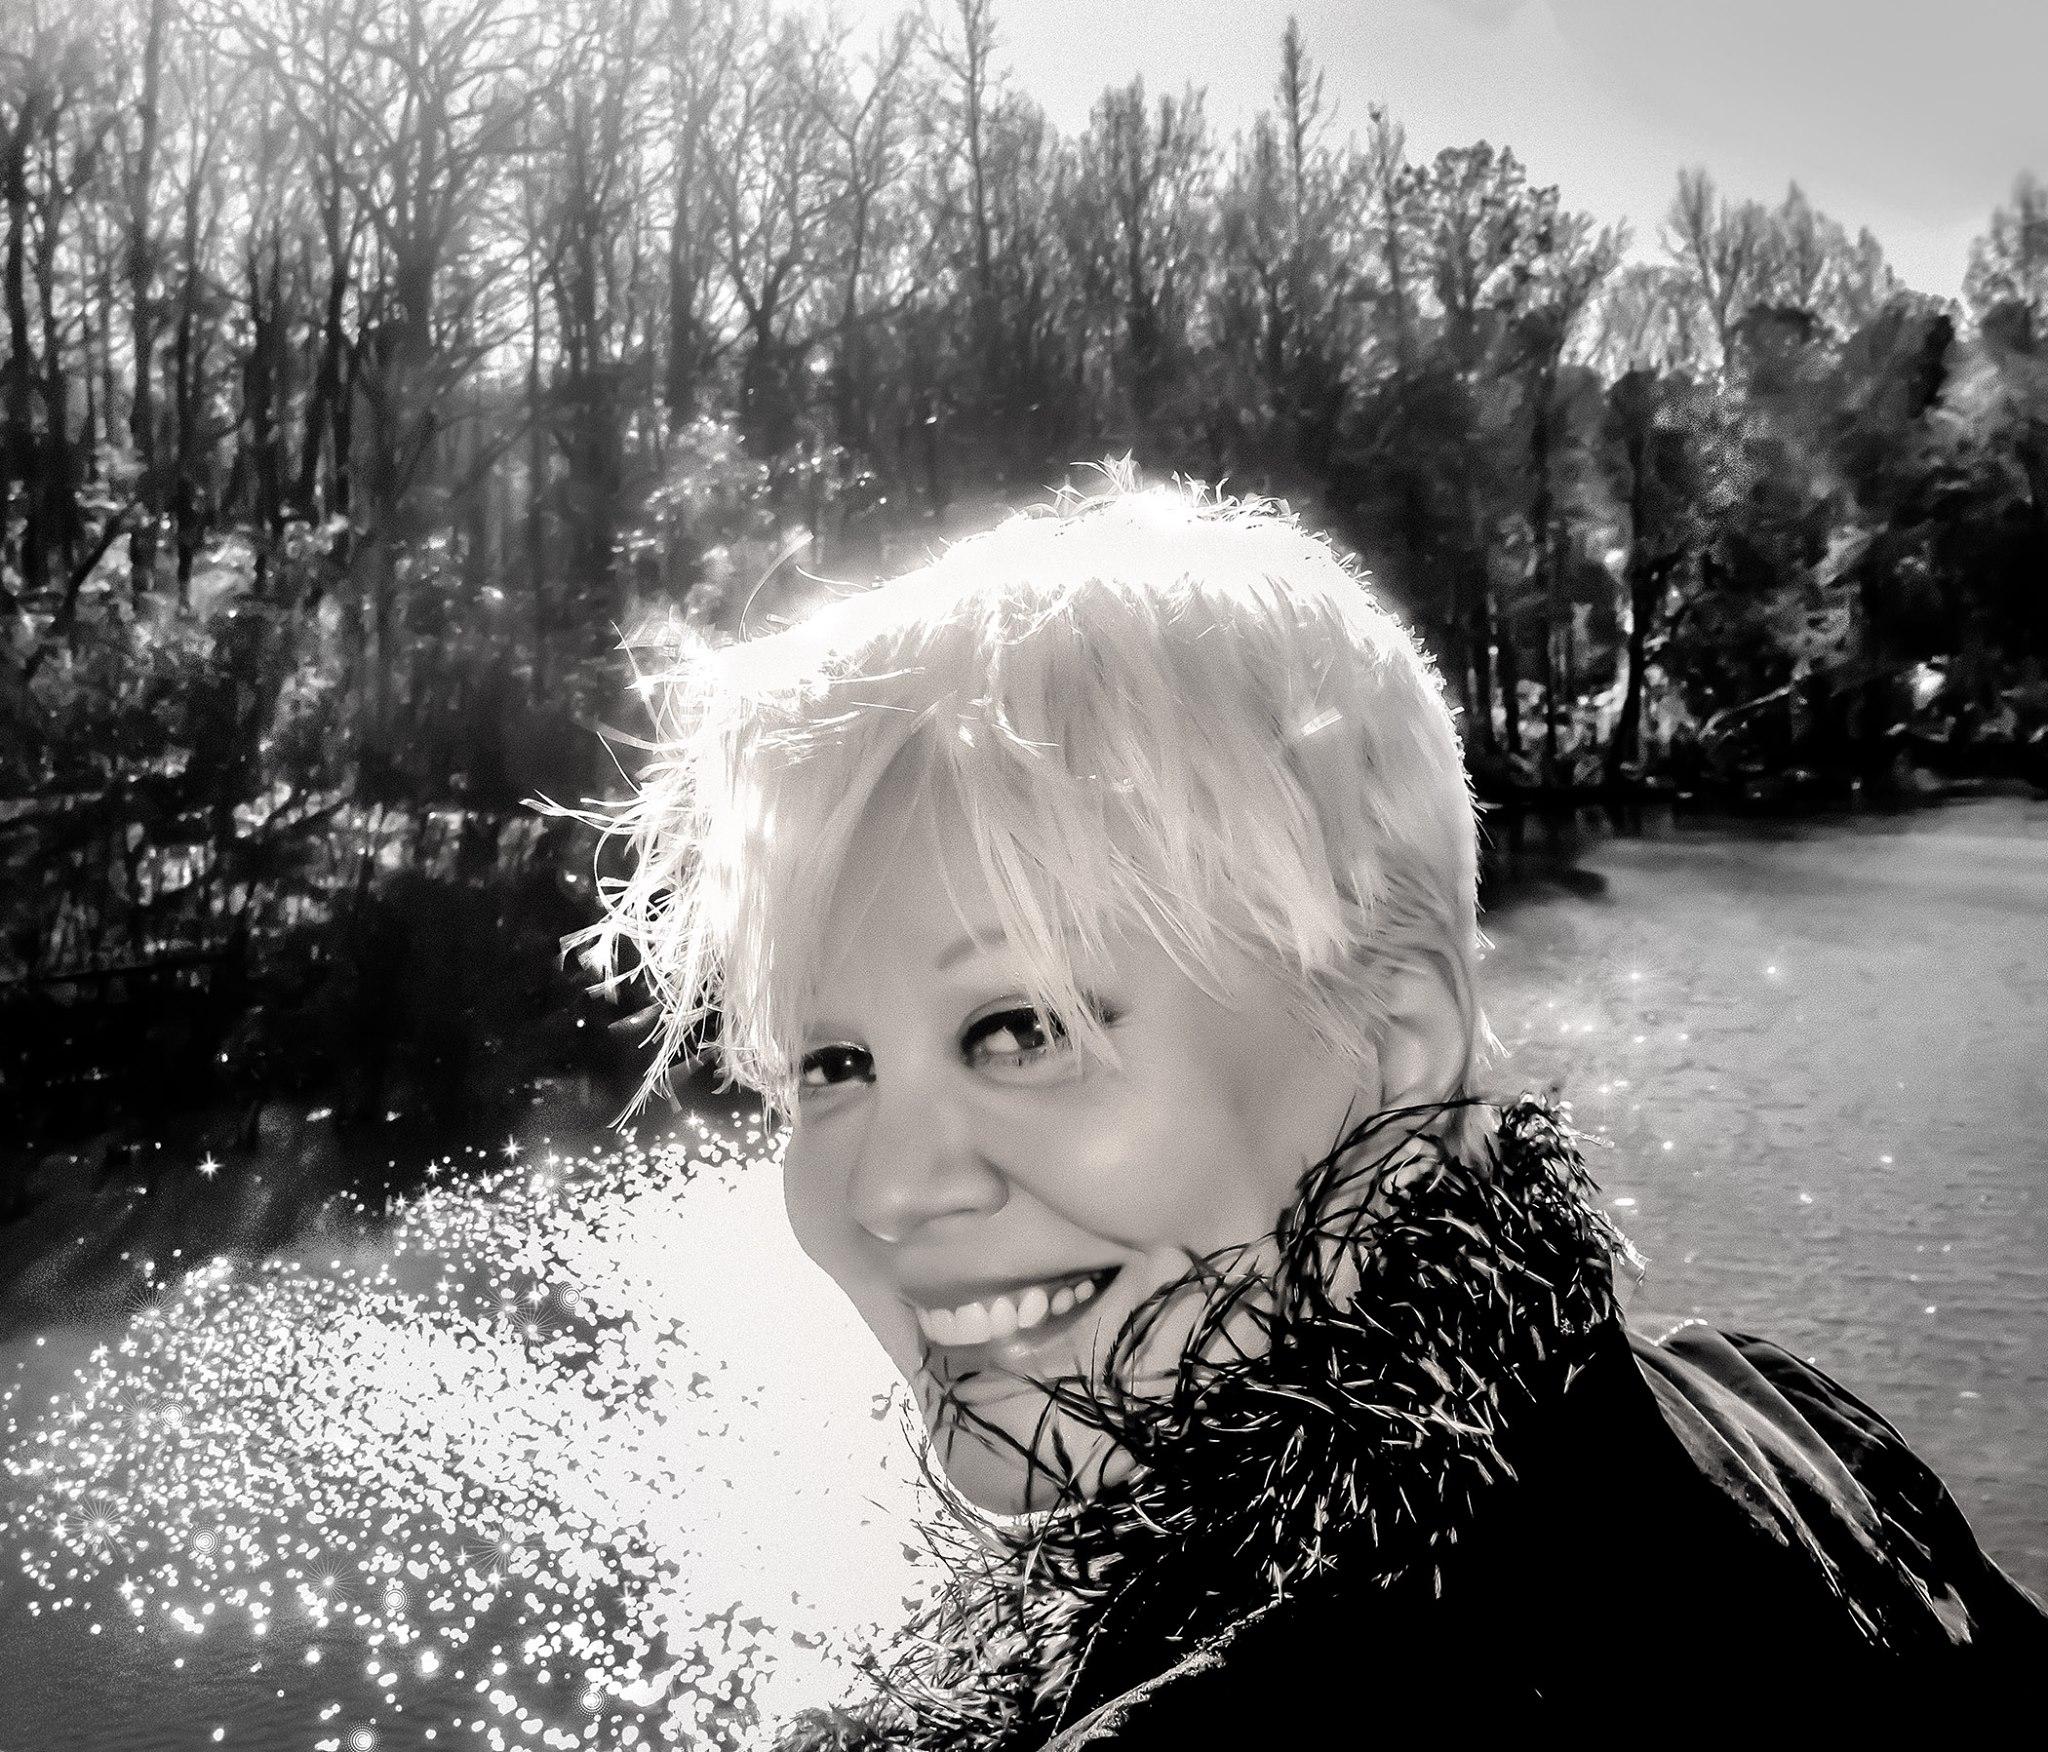 Cindy Wilson Of The B-52s Drops Surprising Solo Album